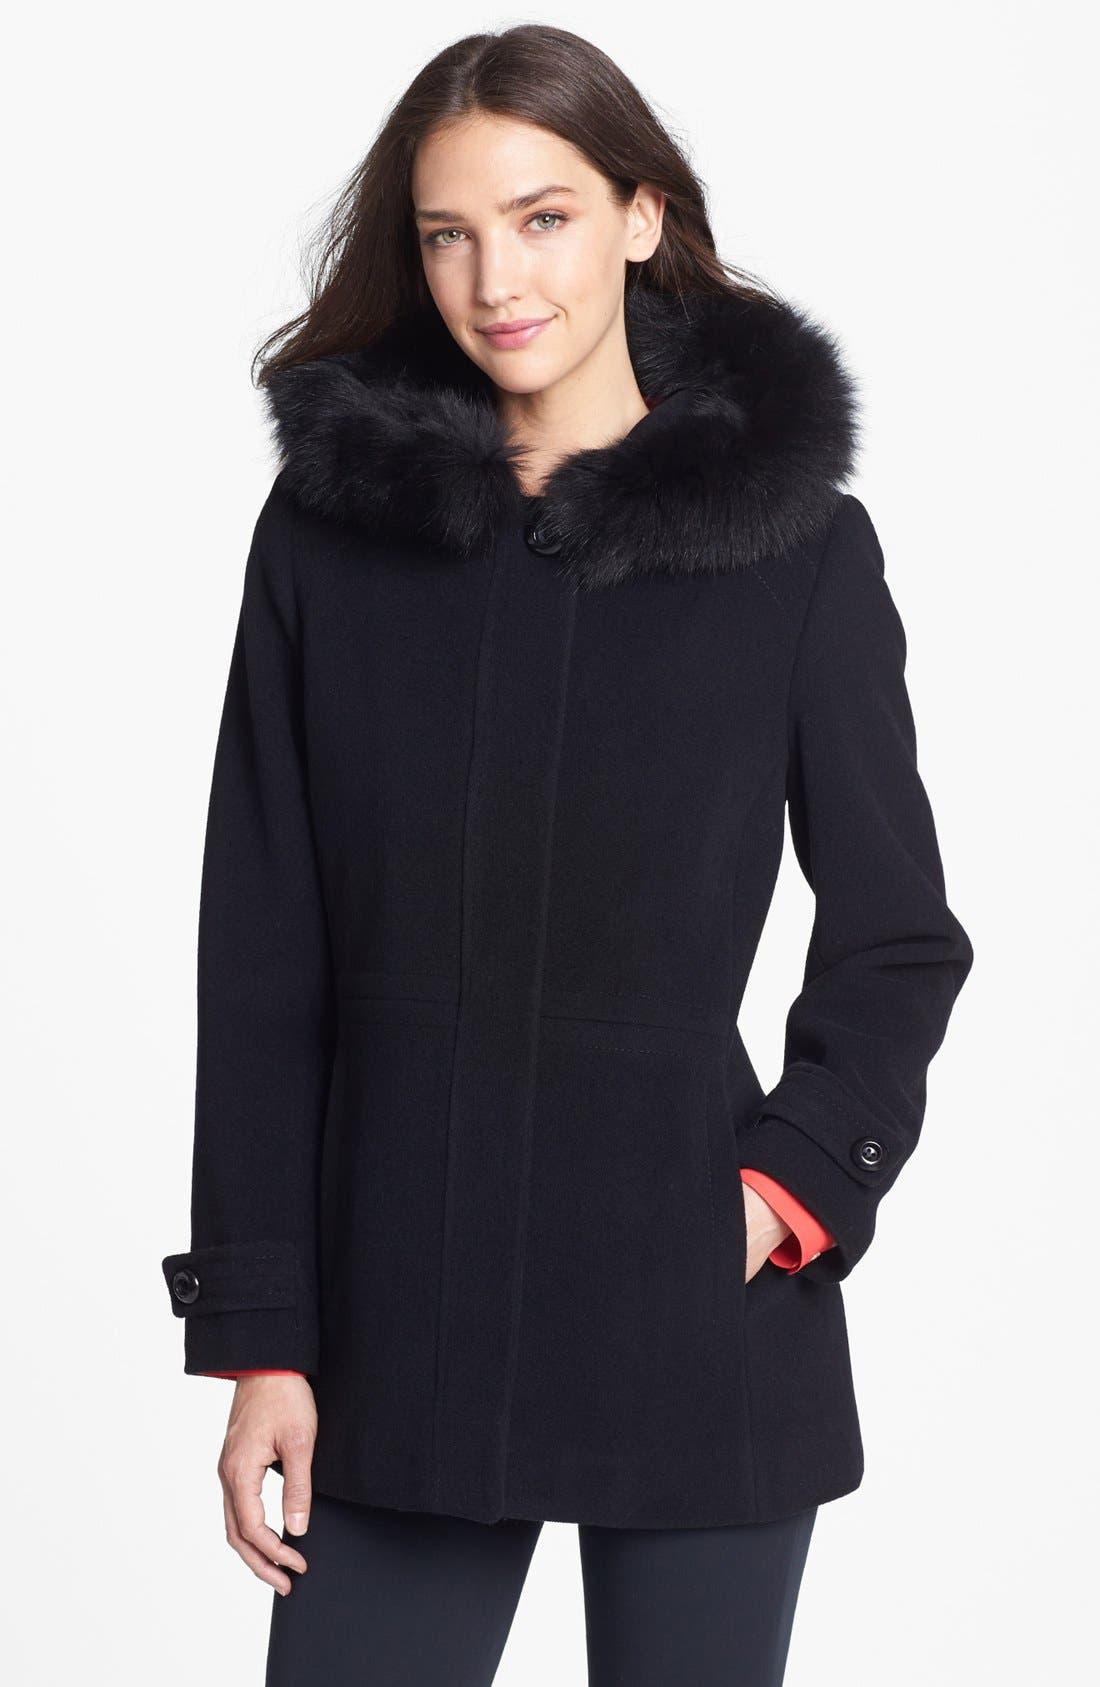 Main Image - Sachi Genuine Fox Fur Trim Hooded Coat (Regular & Petite)(Nordstrom Exclusive)